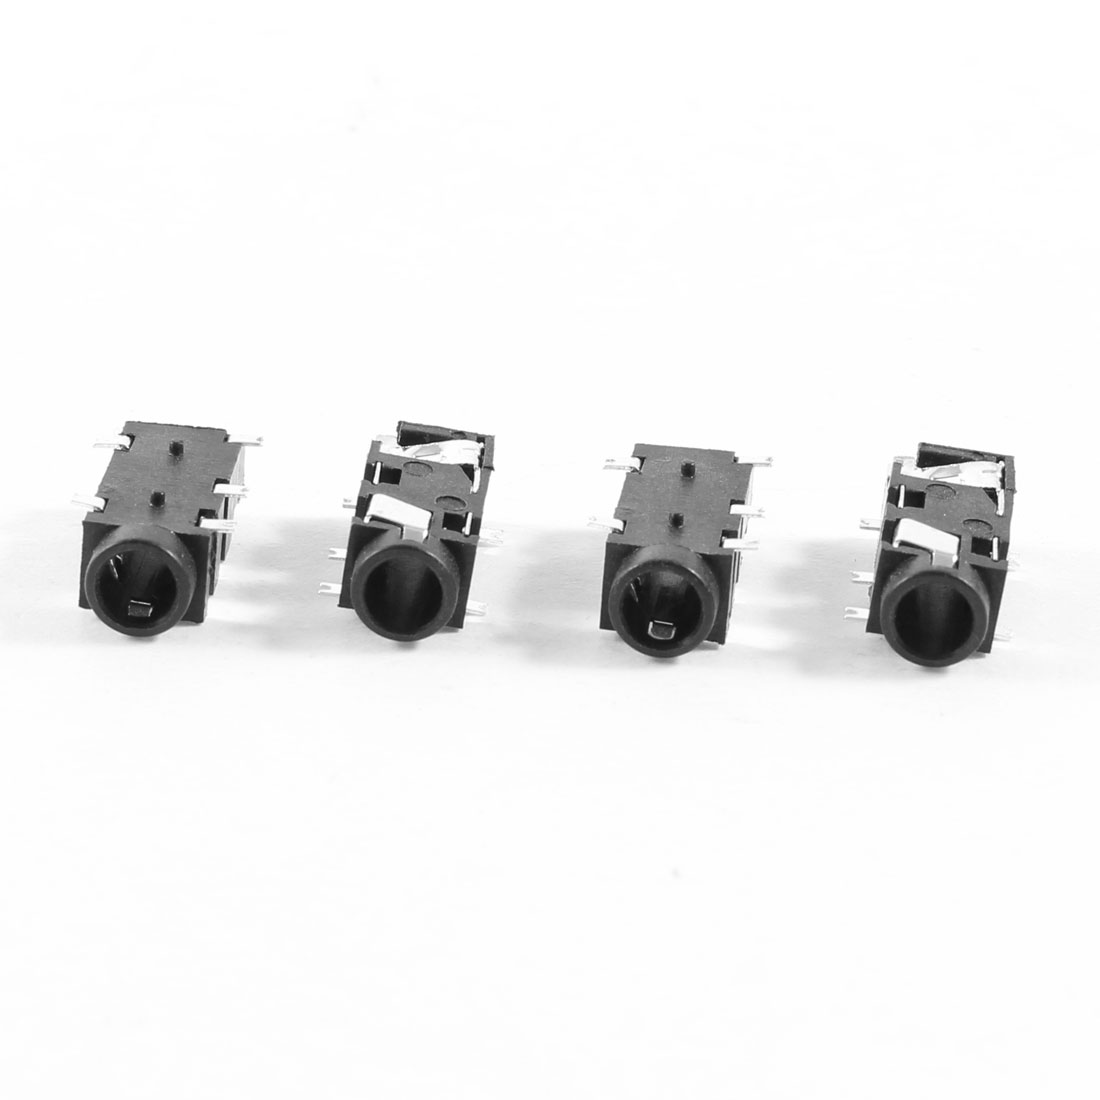 4 Pcs 5-Pin 3.5mm Female Headphone Stereo Socket Jack Adapter Black